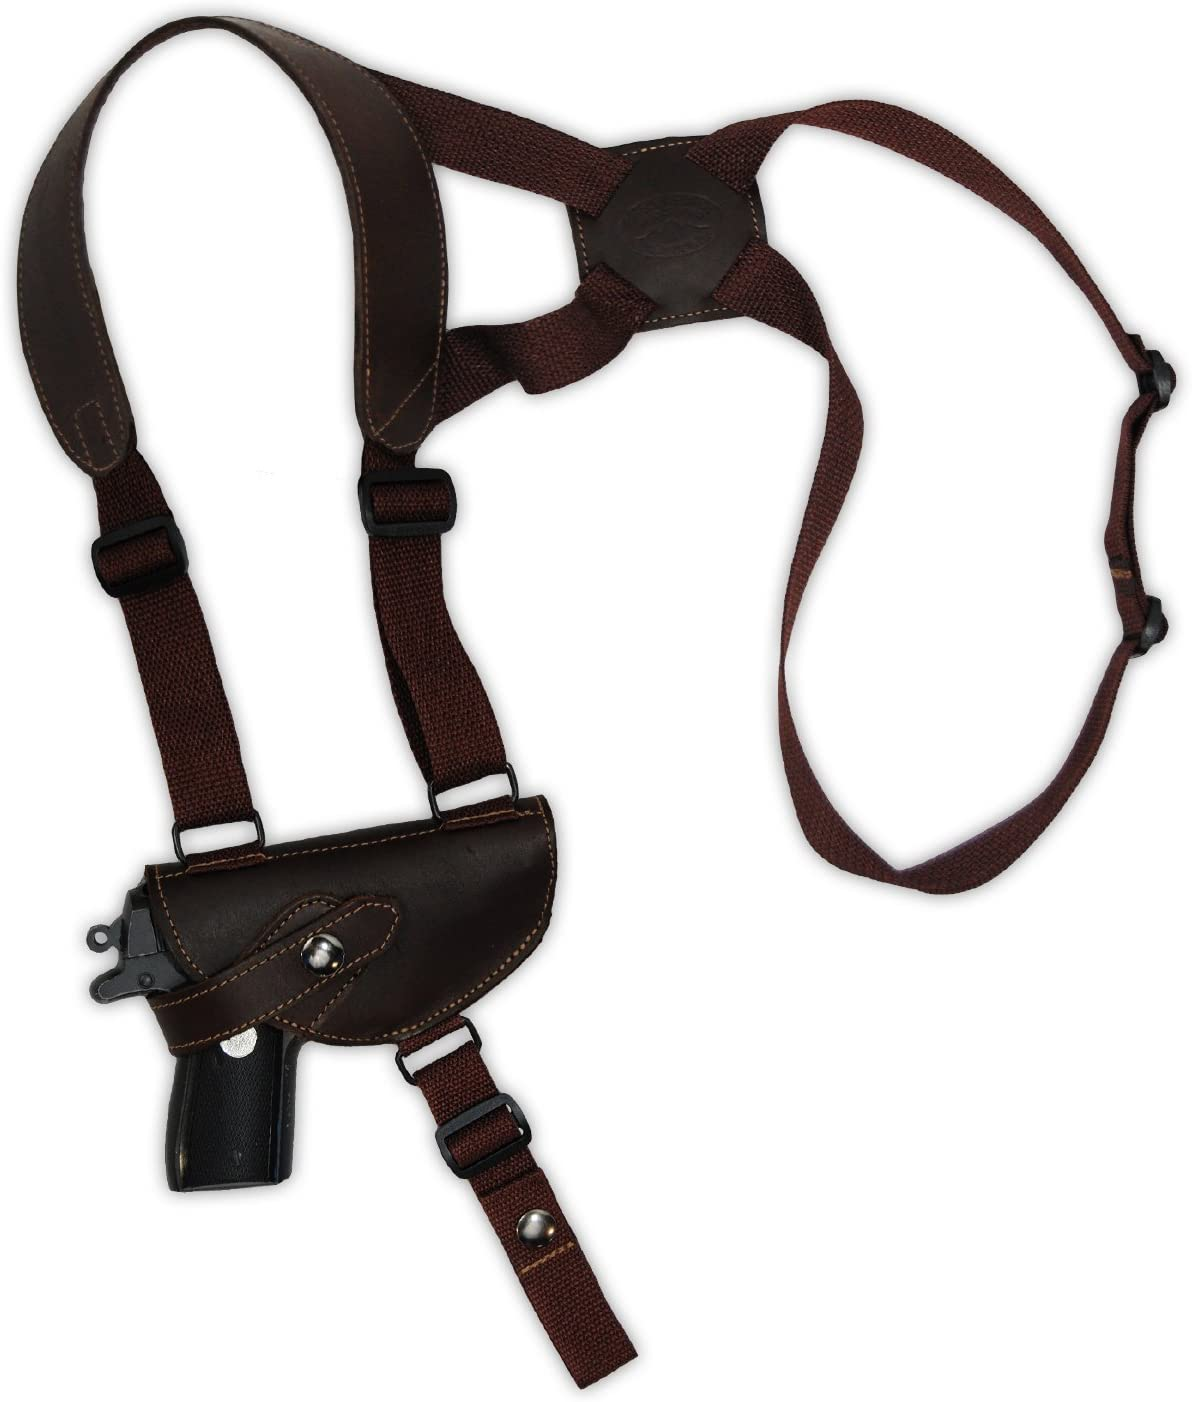 Best Shoulder Holster for S&W M&P Shield